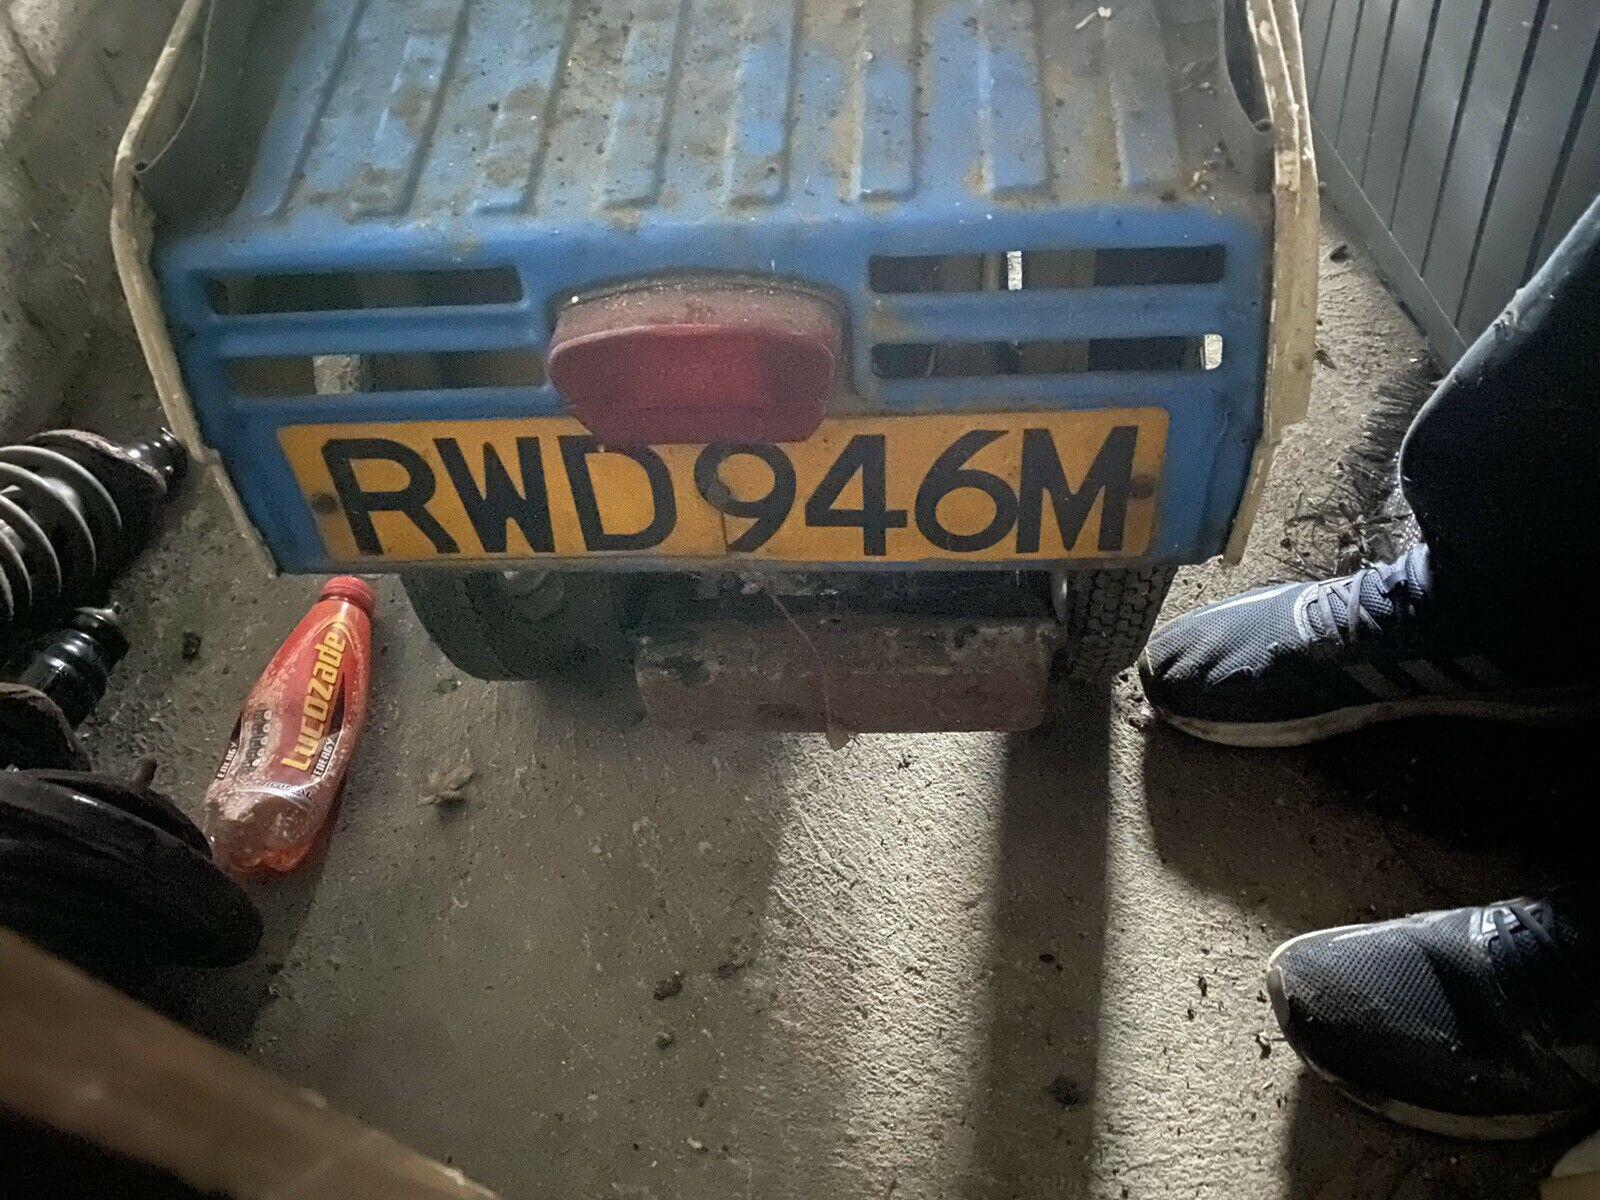 RWD 946 M